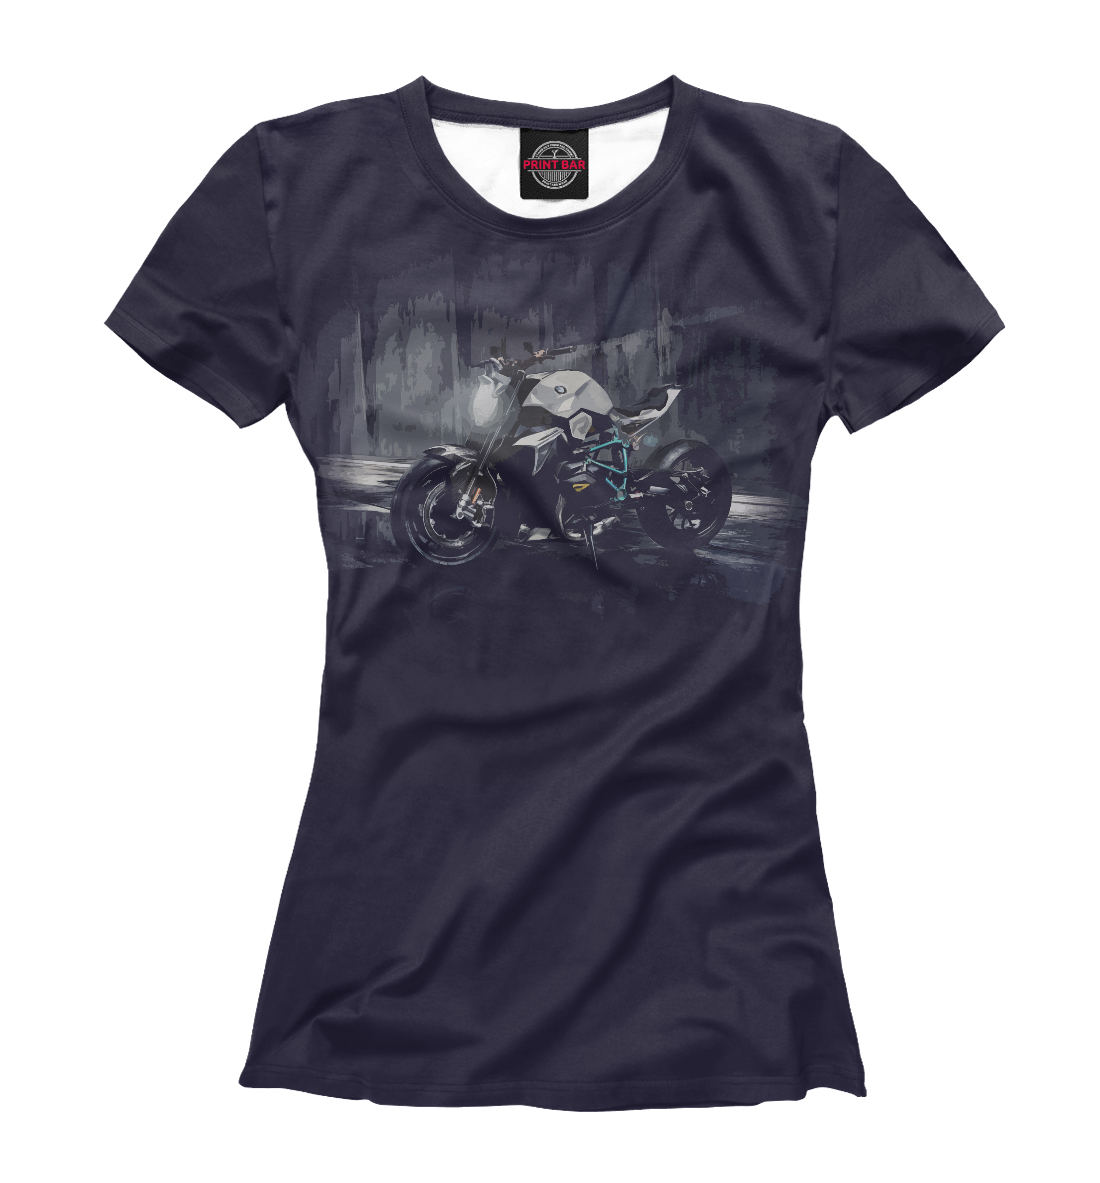 Купить Мотоцикл, Printbar, Футболки, BMW-751402-fut-1